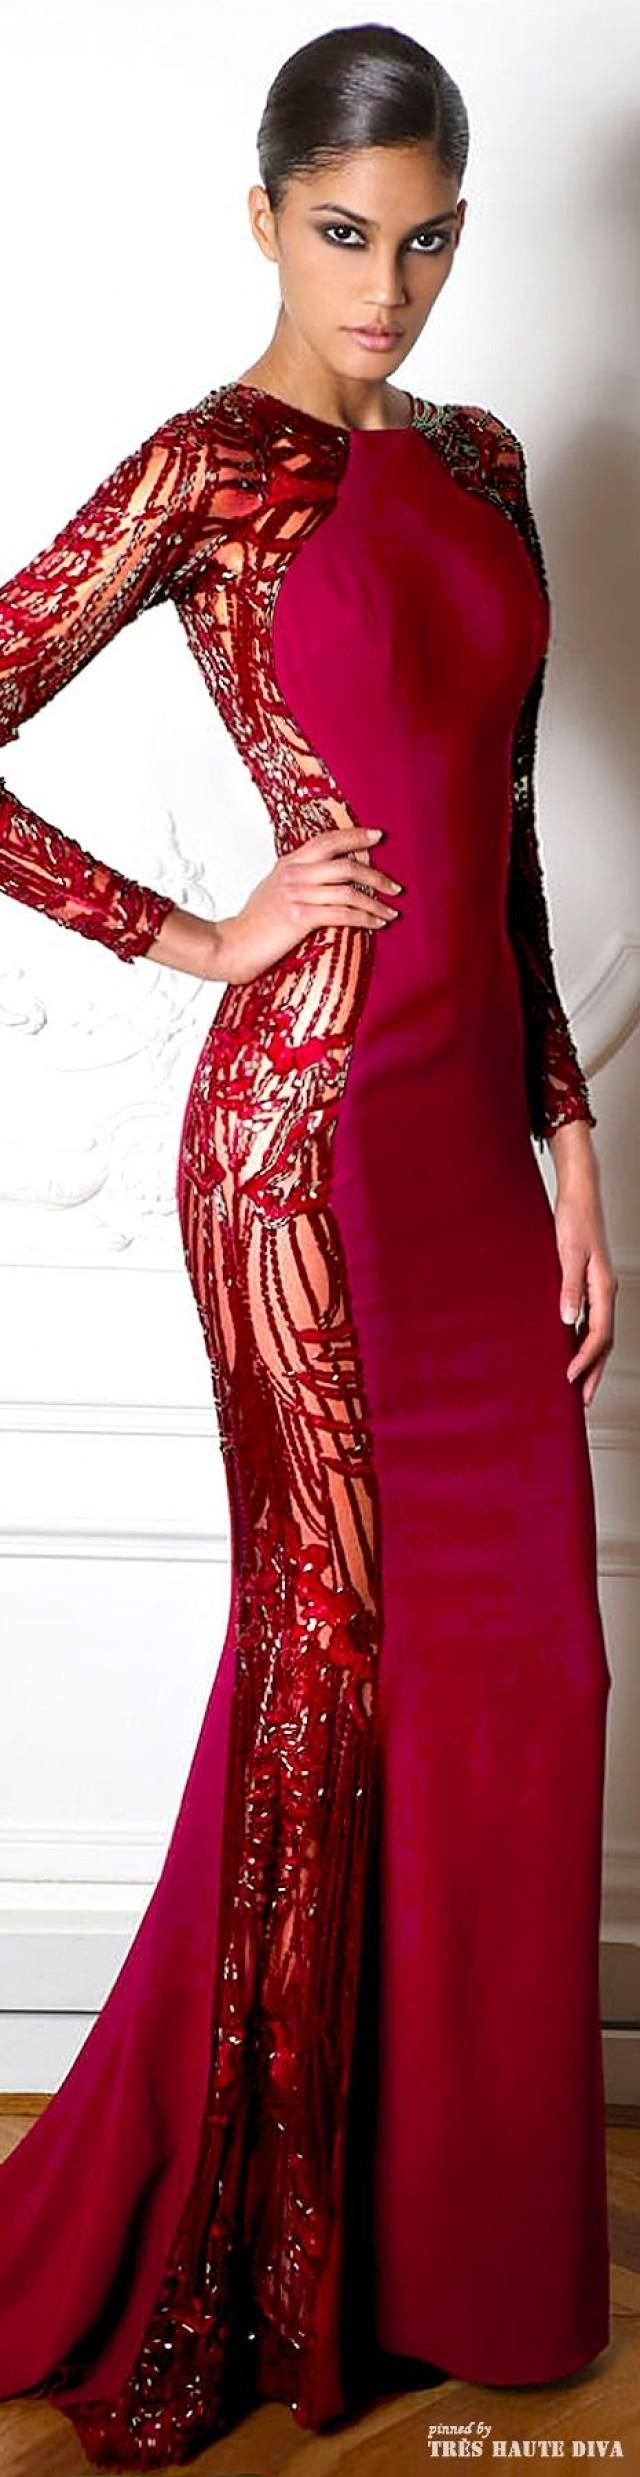 Paris Fashion Week Zuhair Murad Fall/Winter 2014 RTW